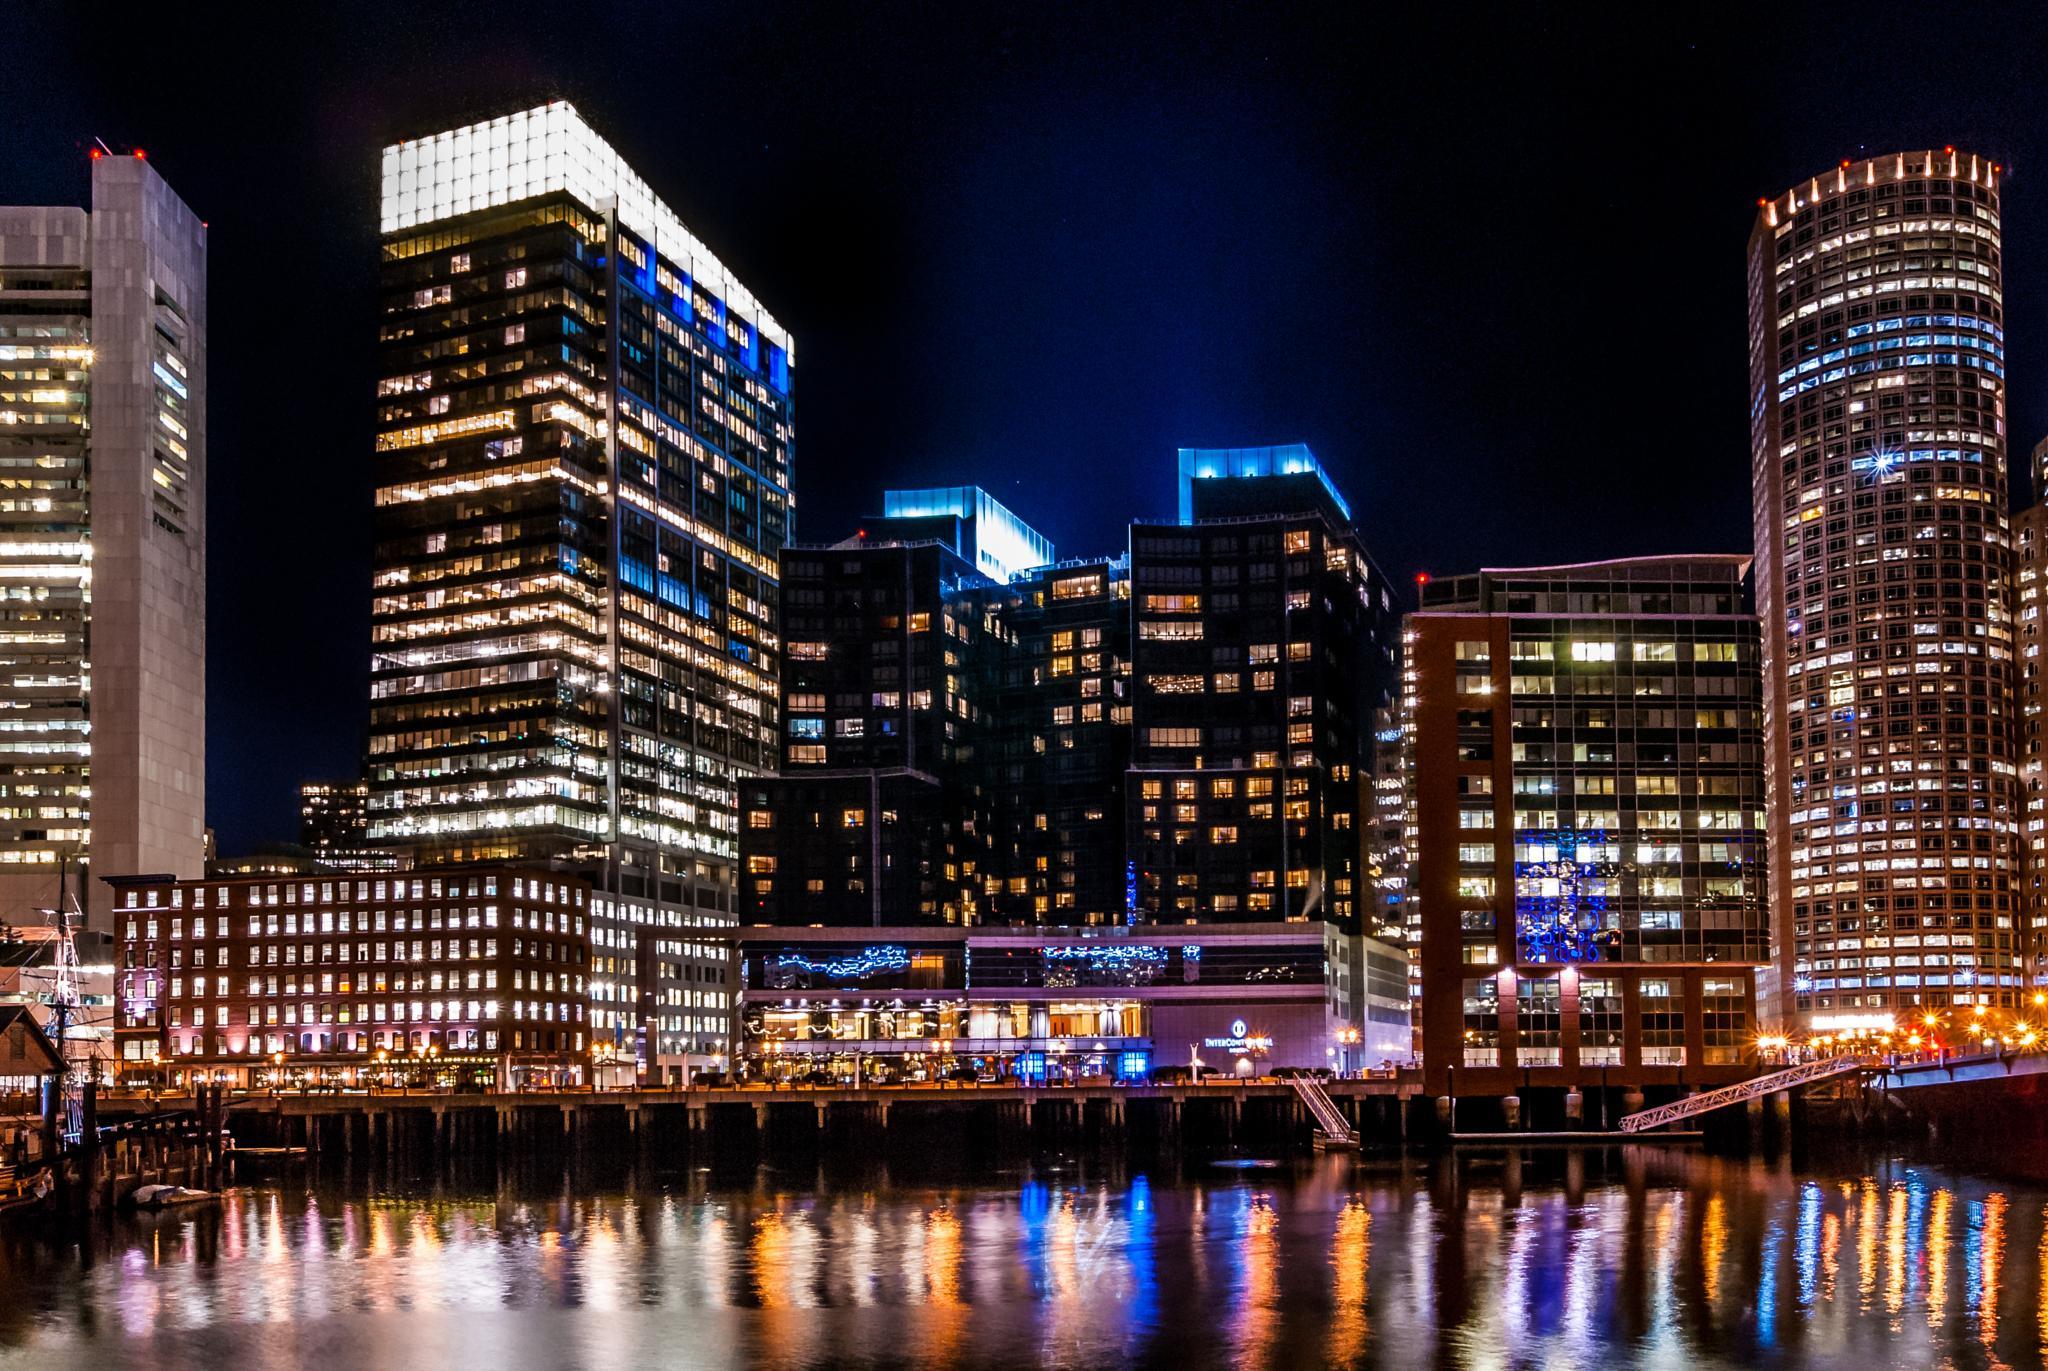 Boston Tea Party Cityscape by philevs